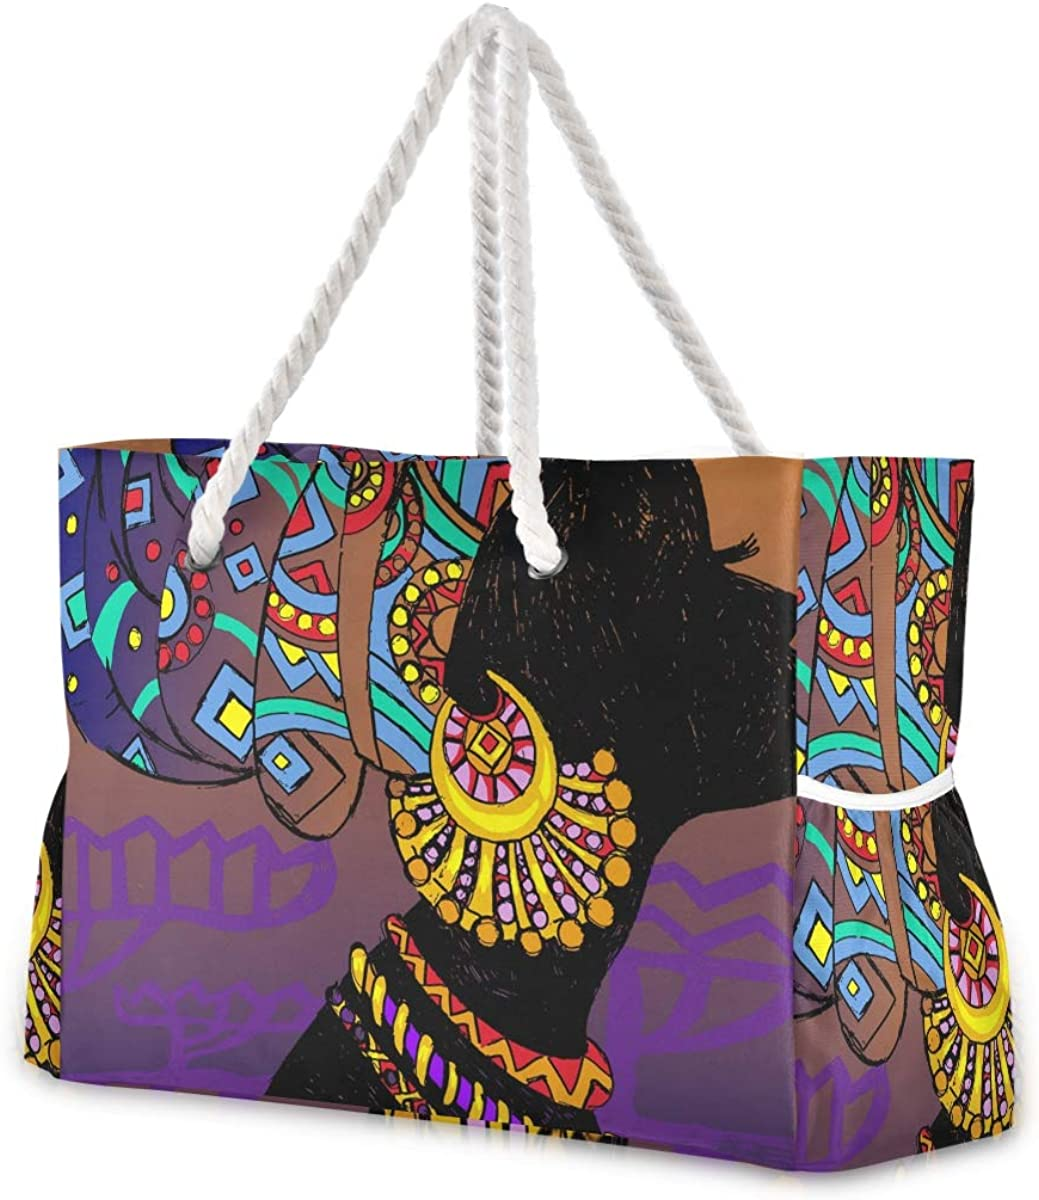 Shoulder bag Rope Handle holiday tote-bag-floral Print-zip top SPECIAL OFFER